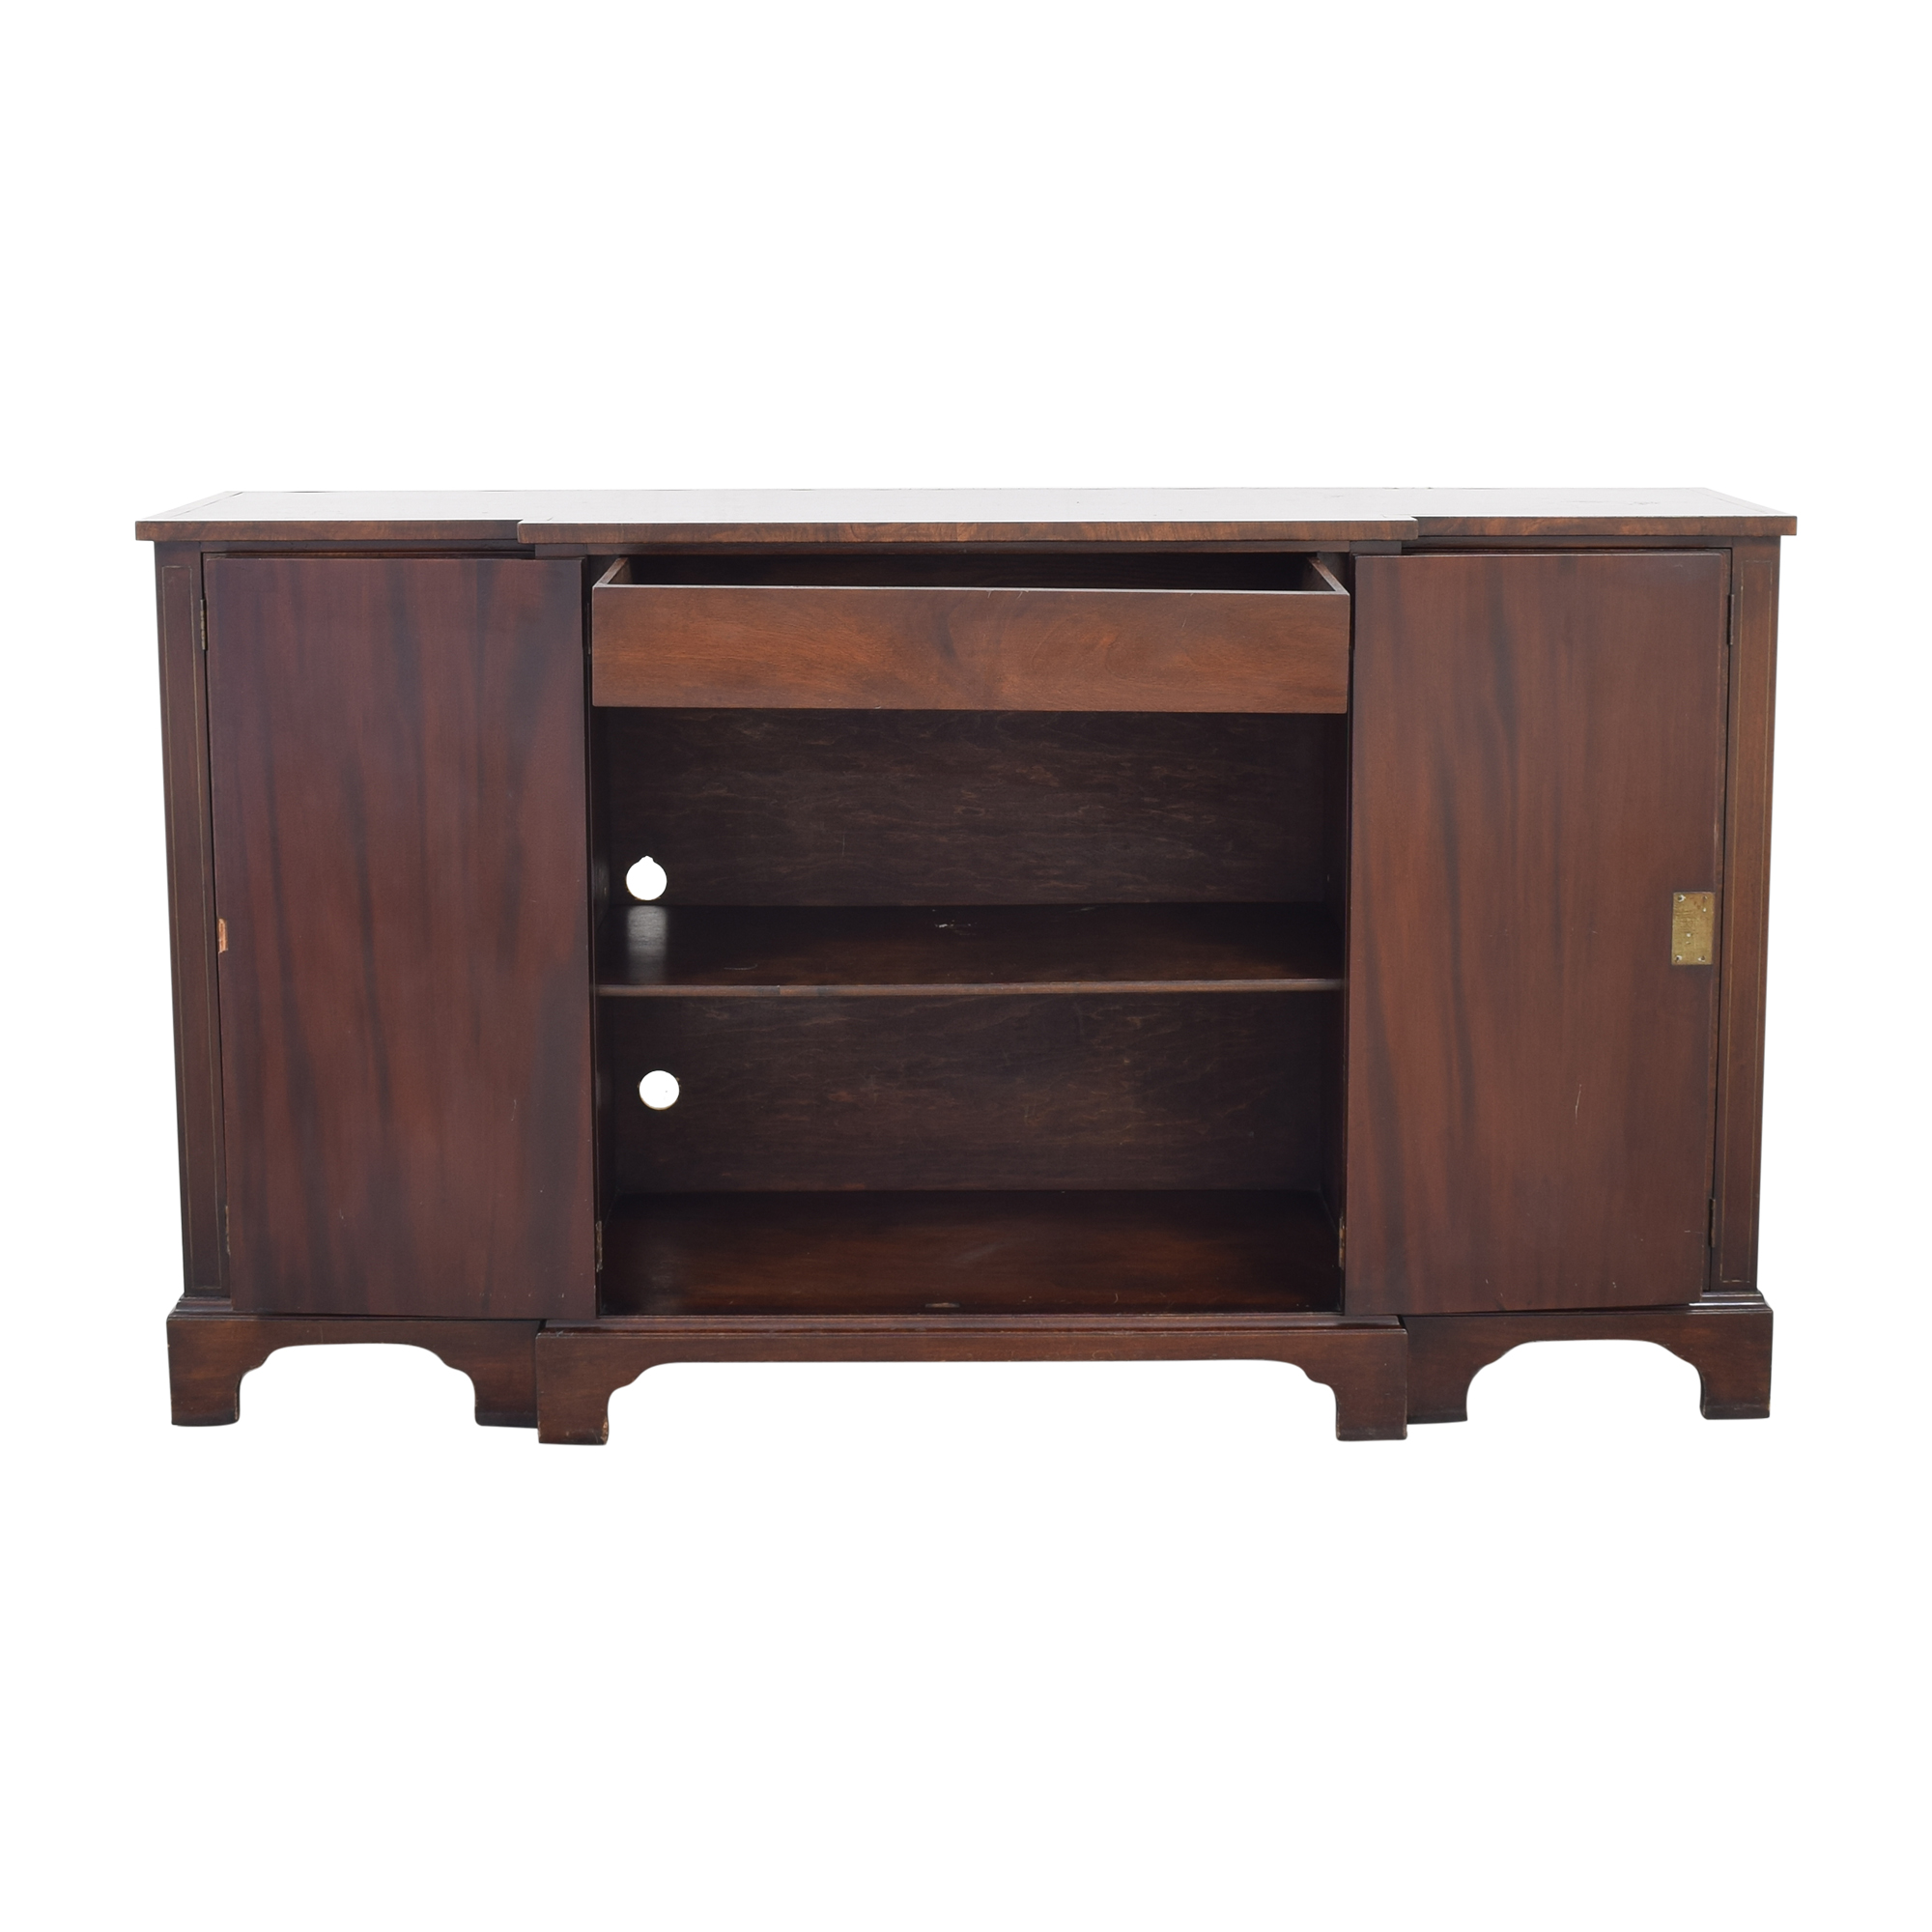 buy Vintage Sideboard with Lock and Key